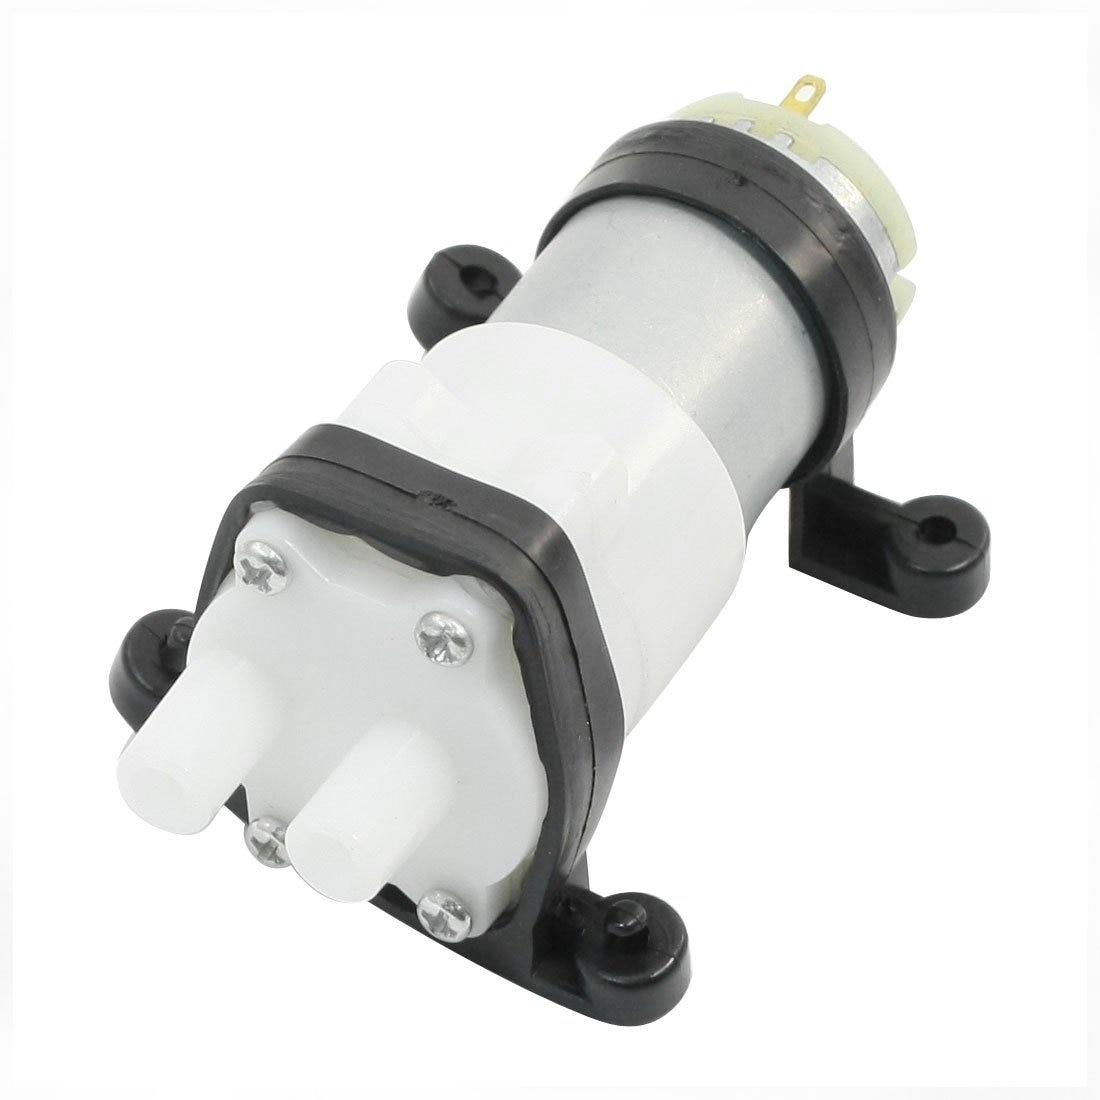 LIXF HOT Priming Diaphragm Pump Spray Motor 12V for Water Dispenser замок двери задка газель next фургон